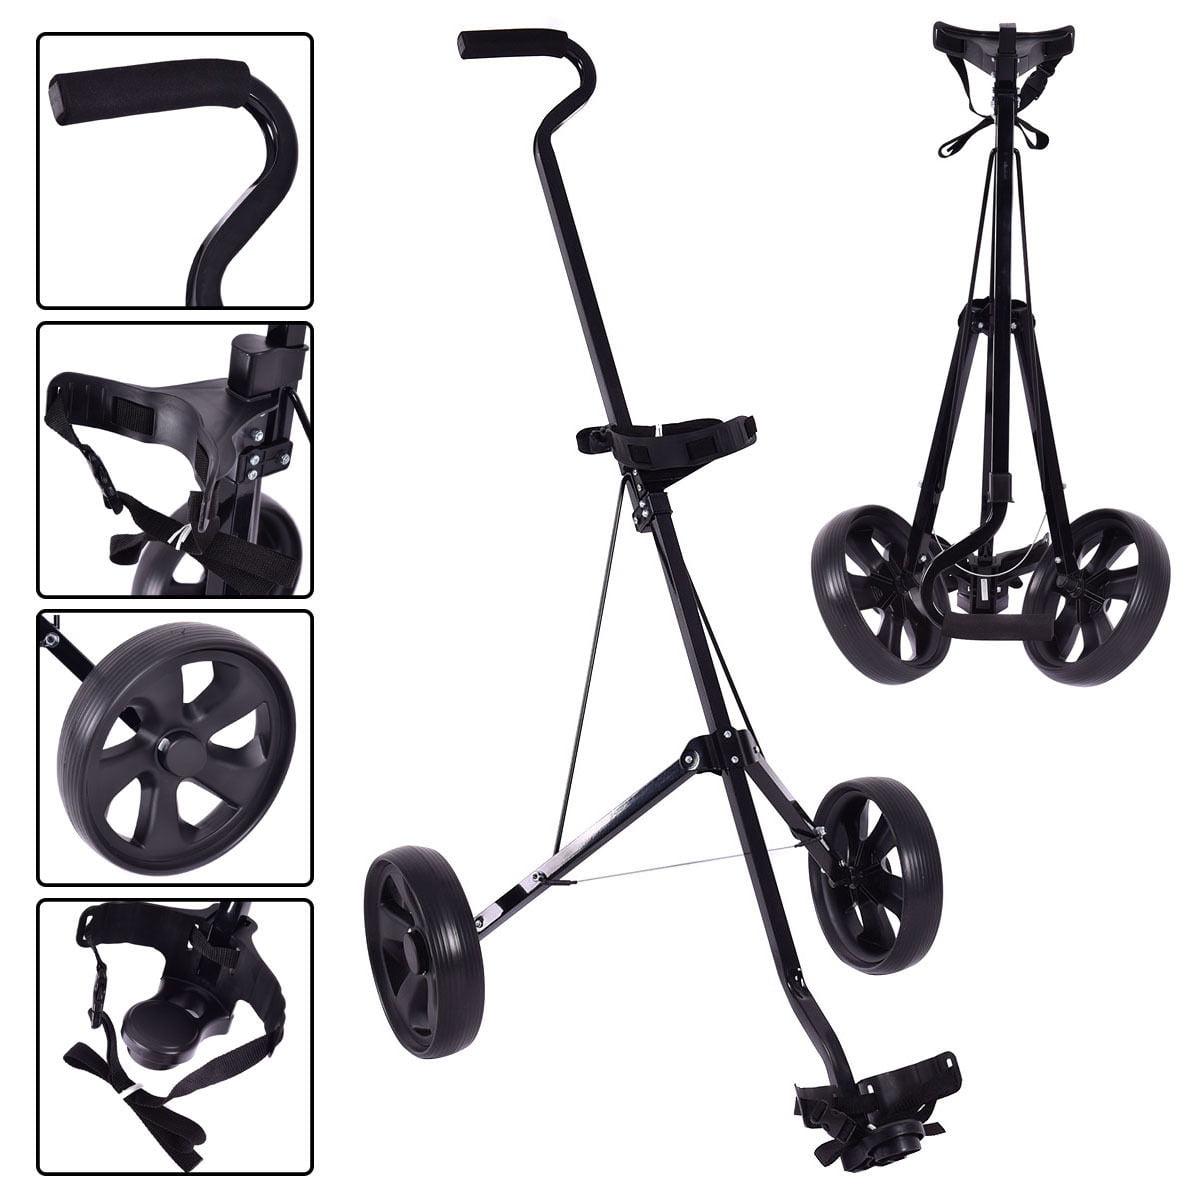 Costway Foldable 2 Wheel Push Pull Golf Club Cart Trolley Swivel Steel Lightweight Black by Costway